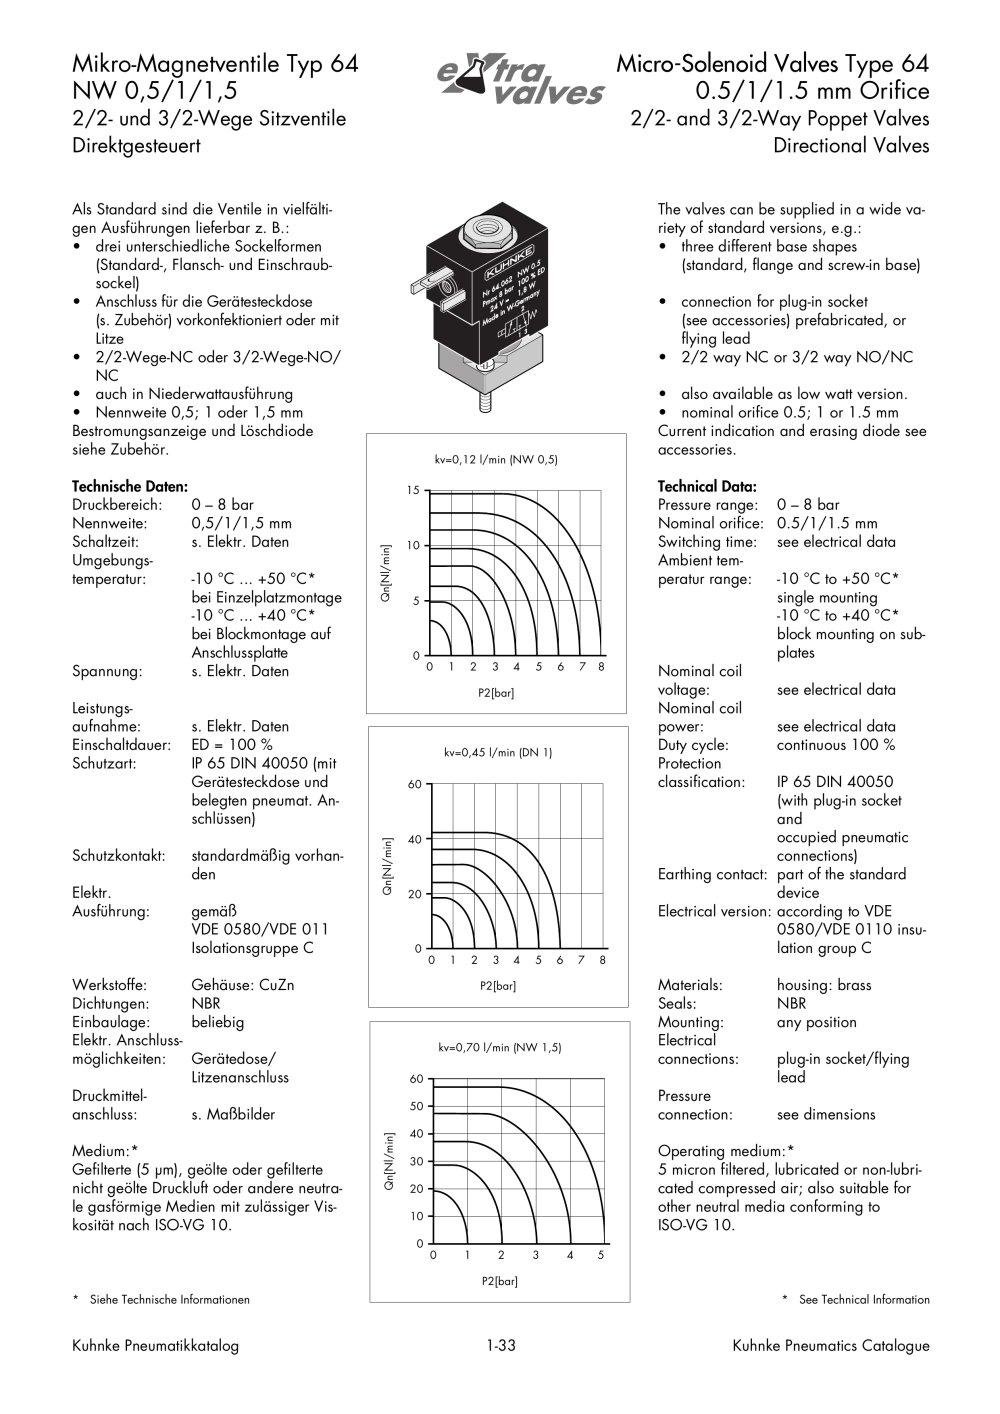 Solenoid Valves Type 64 - Kendrion Kuhnke Automation GmbH - PDF ...